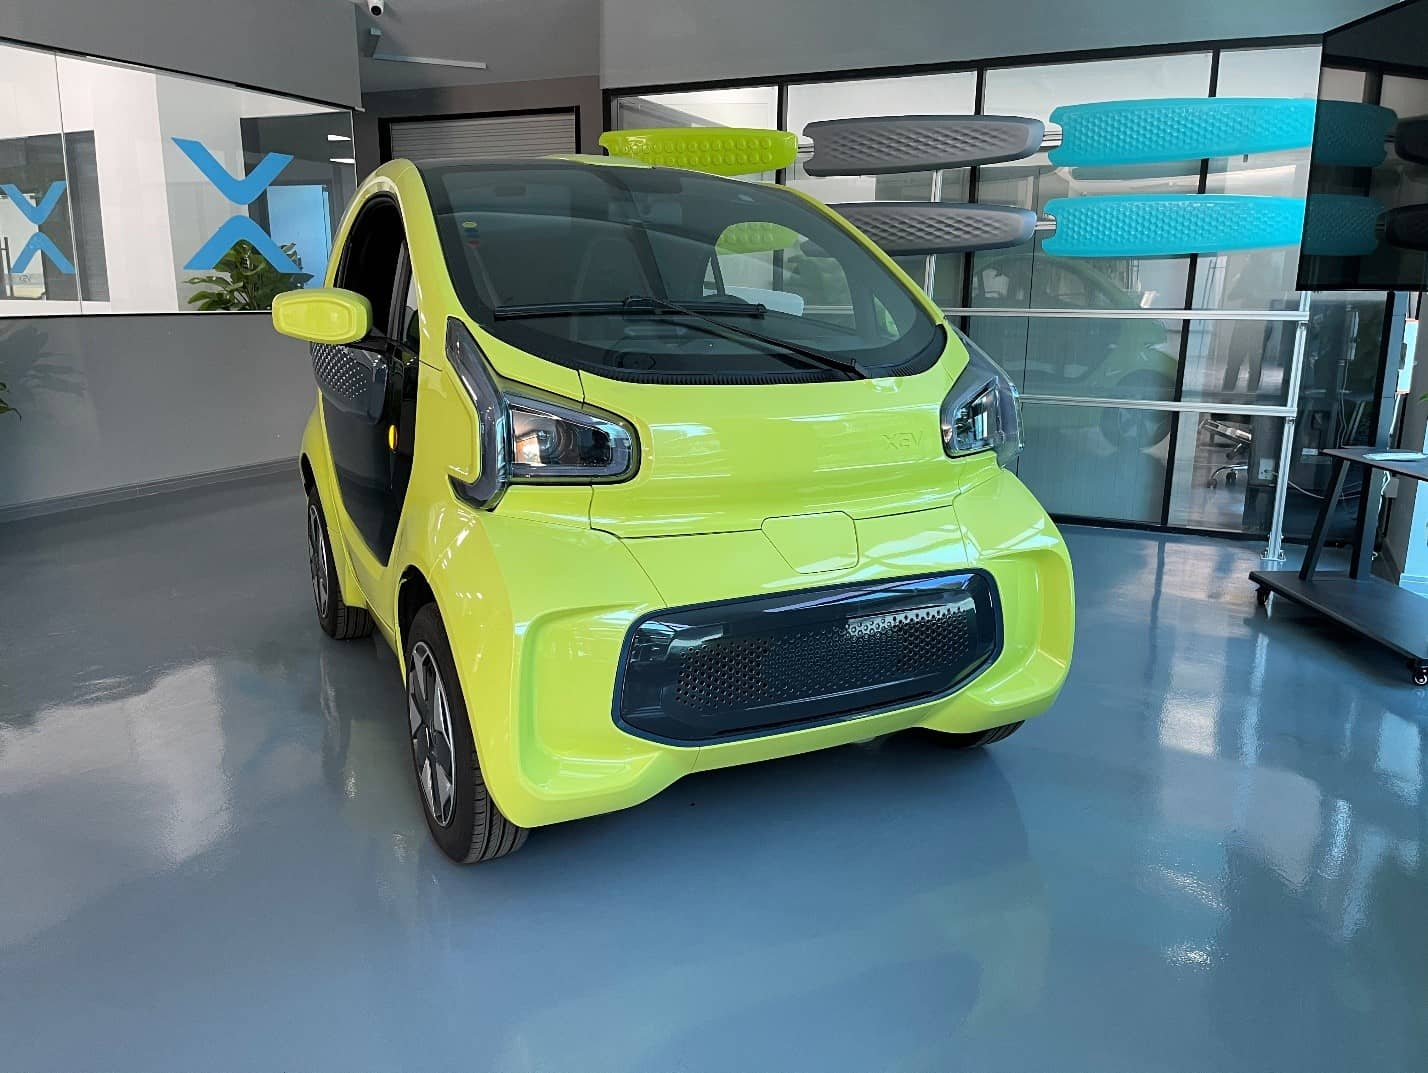 X-EV Electric Car Customization with Large 3D Printer